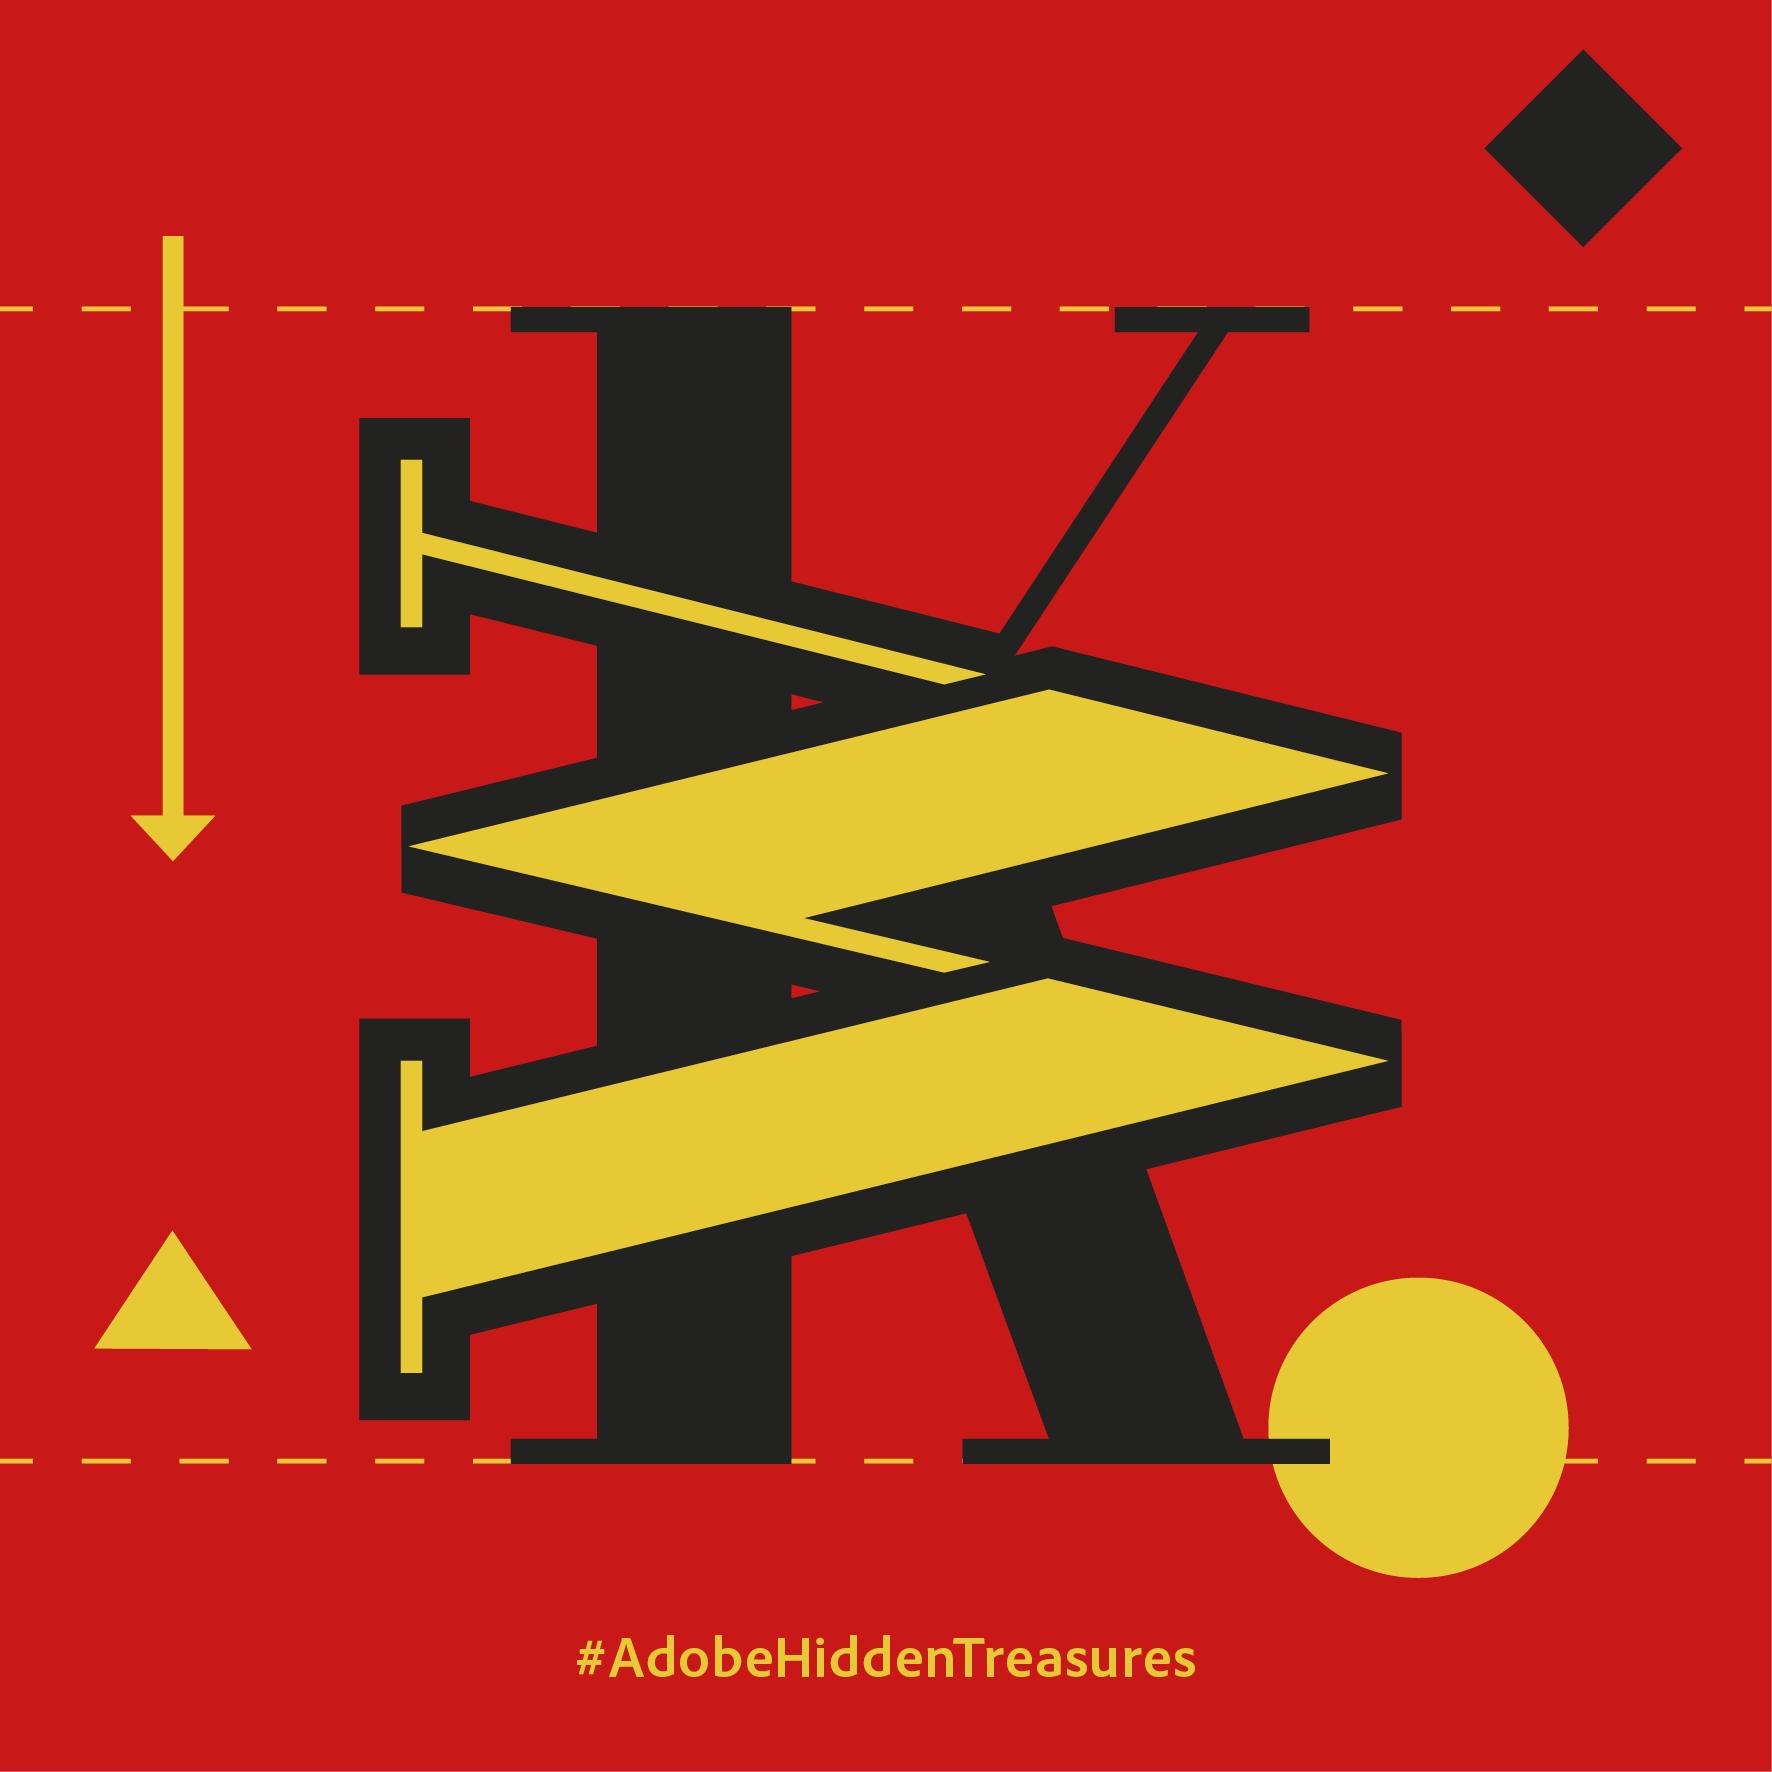 C1_Adobe-HiddenTreasures-Palma-Typejockeys_MaxMustermann.png